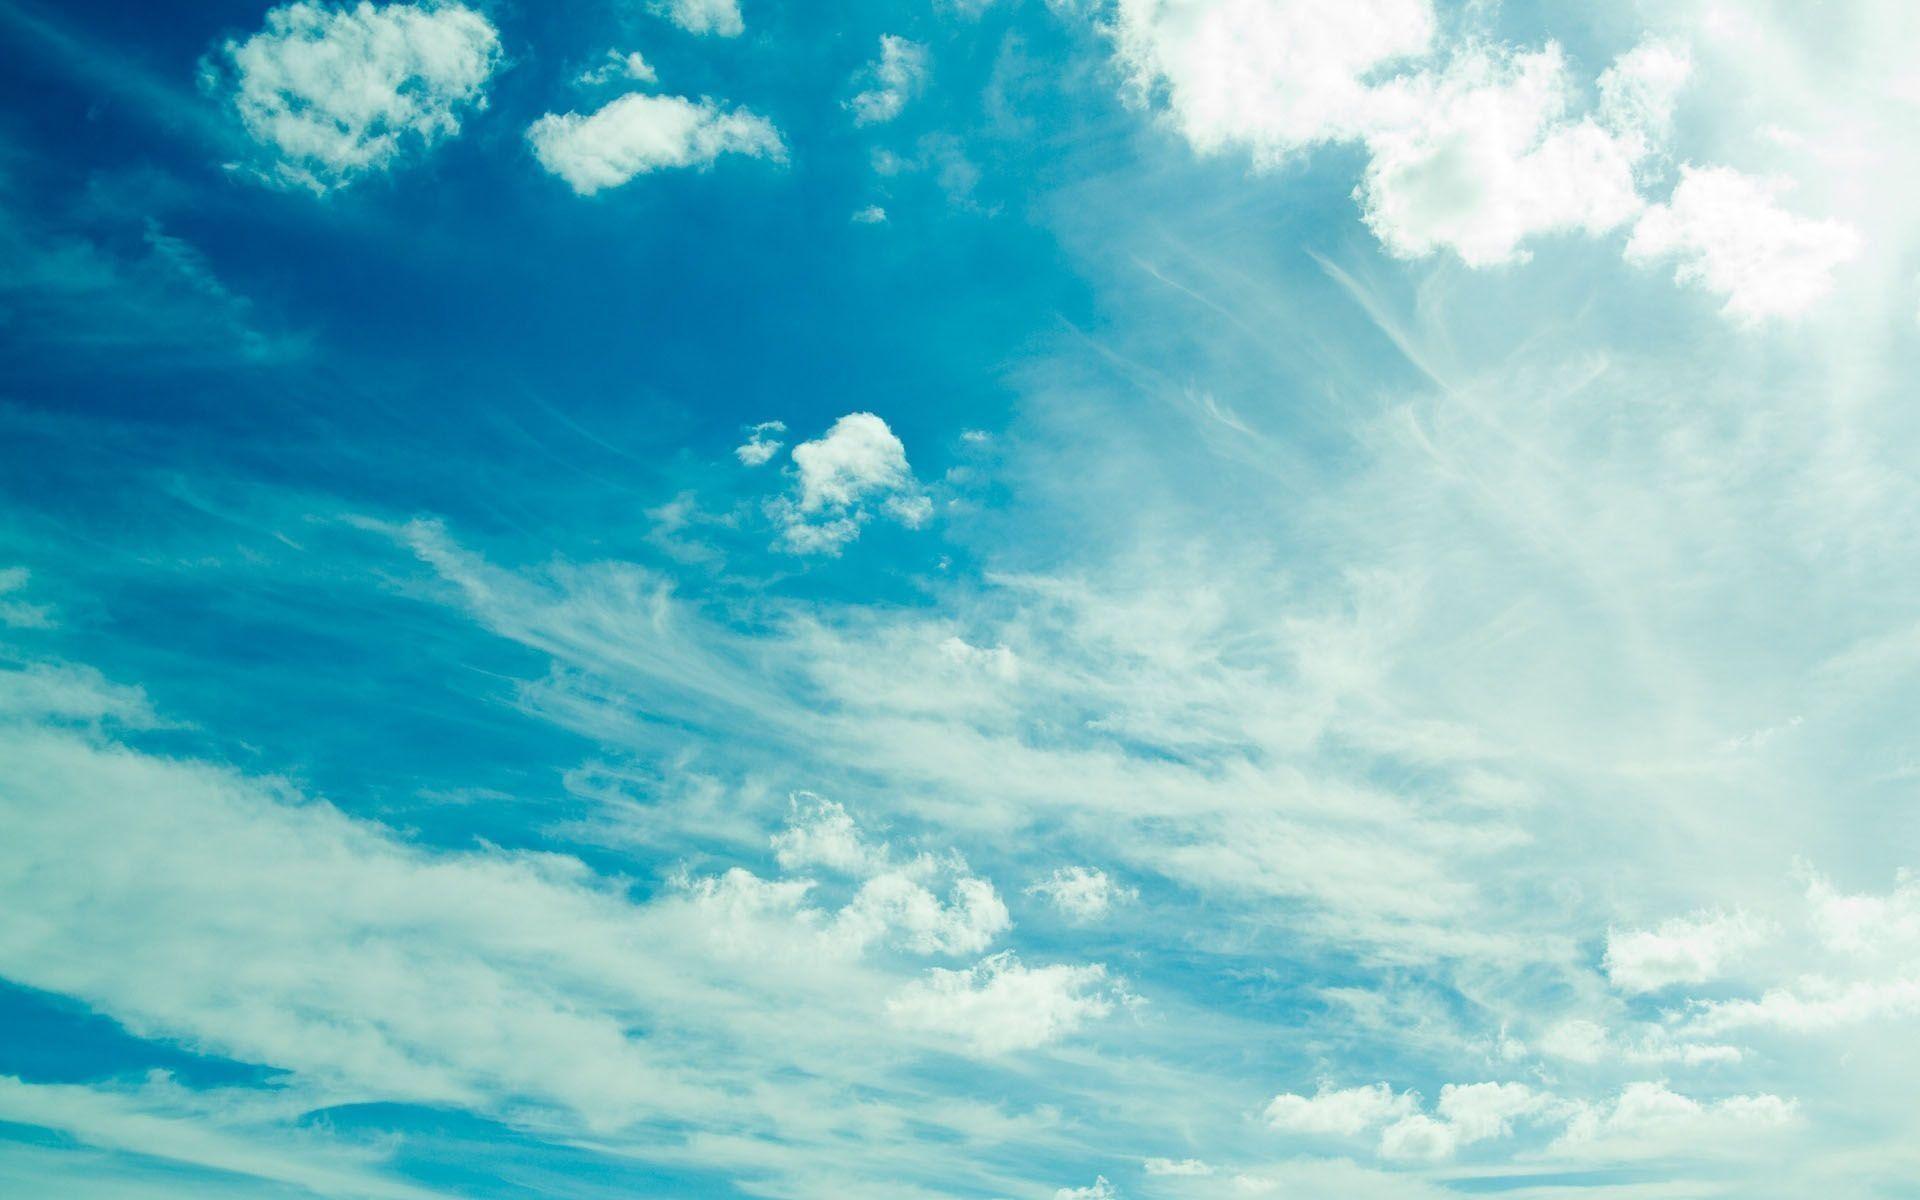 Blue Sky With Cloud Wallpaper High Resolution #3849 Wallpaper .